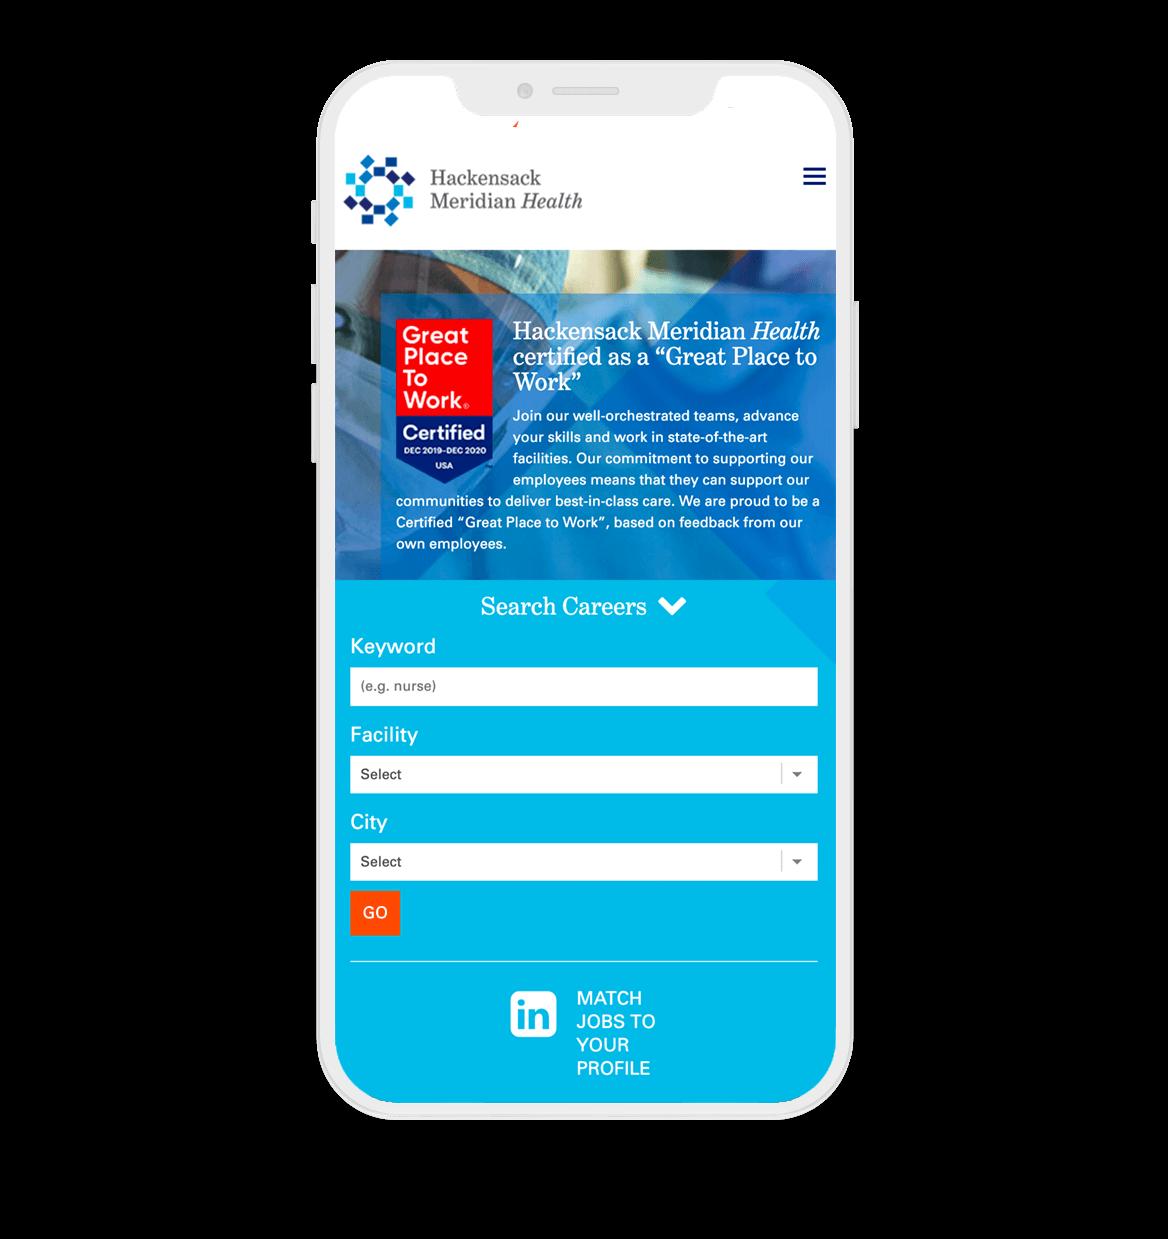 Mobile phone screen displaying Hackensack Meridian Health careers page